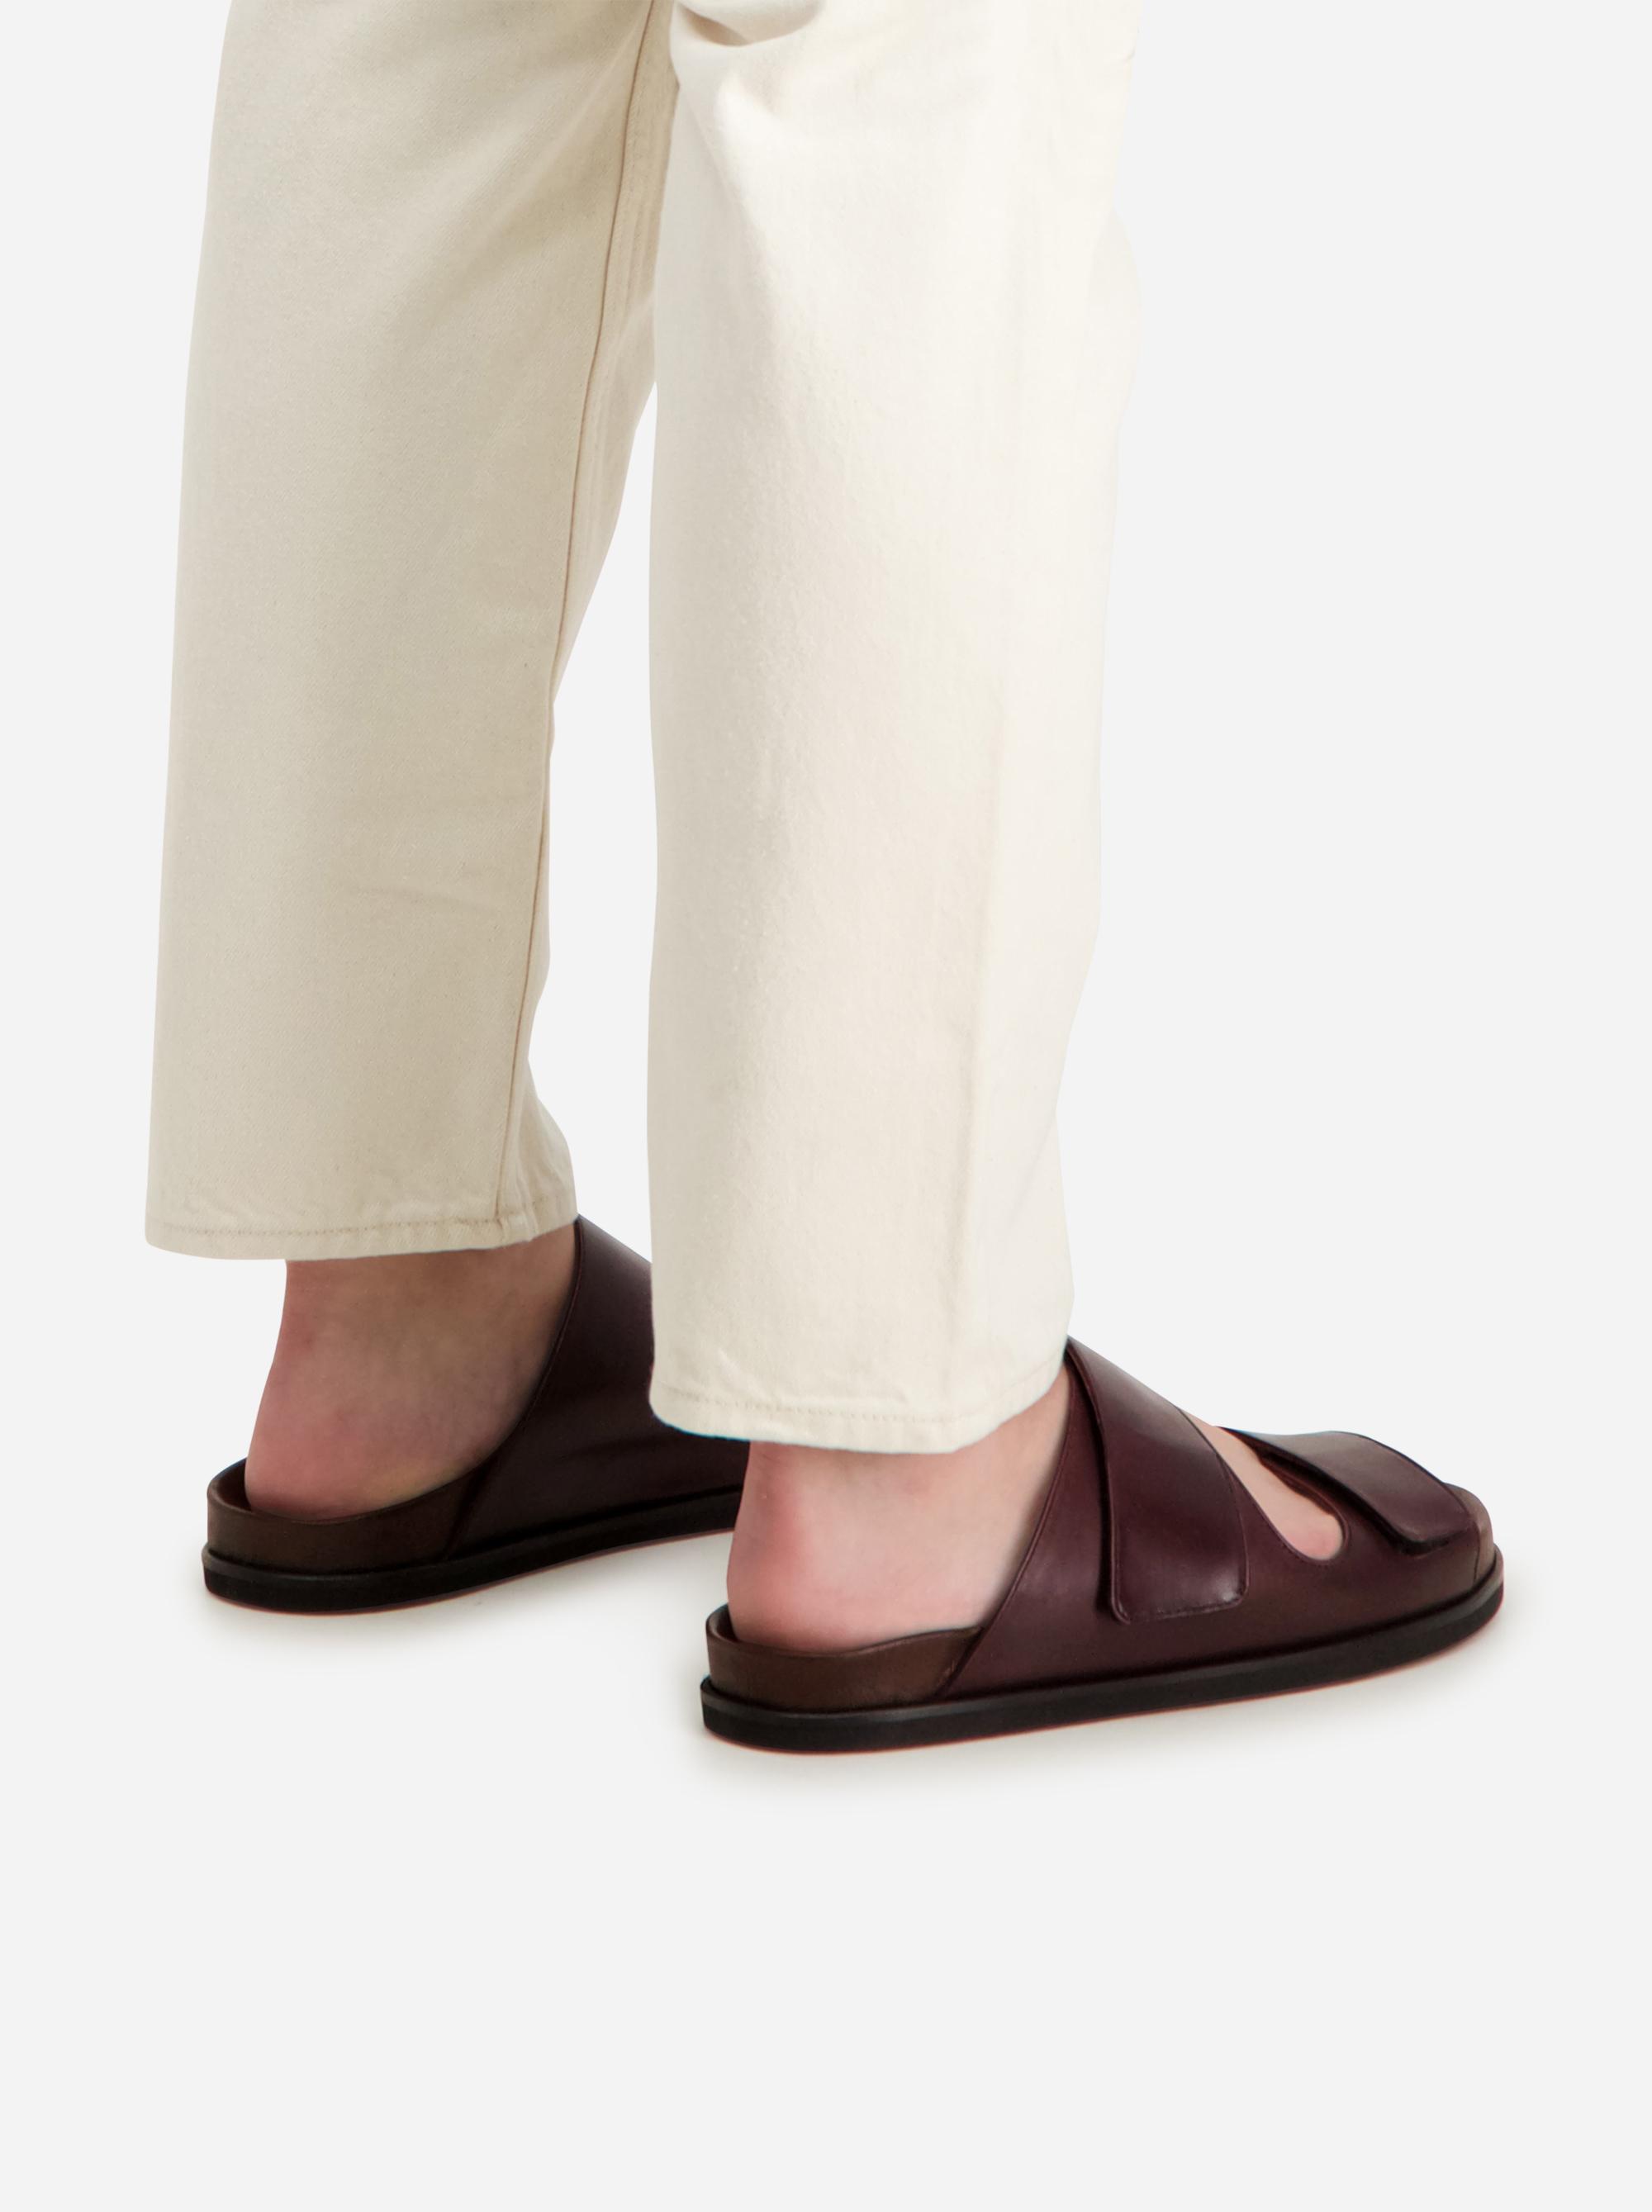 Teym - The Sandal - Burgundy - Men - 1